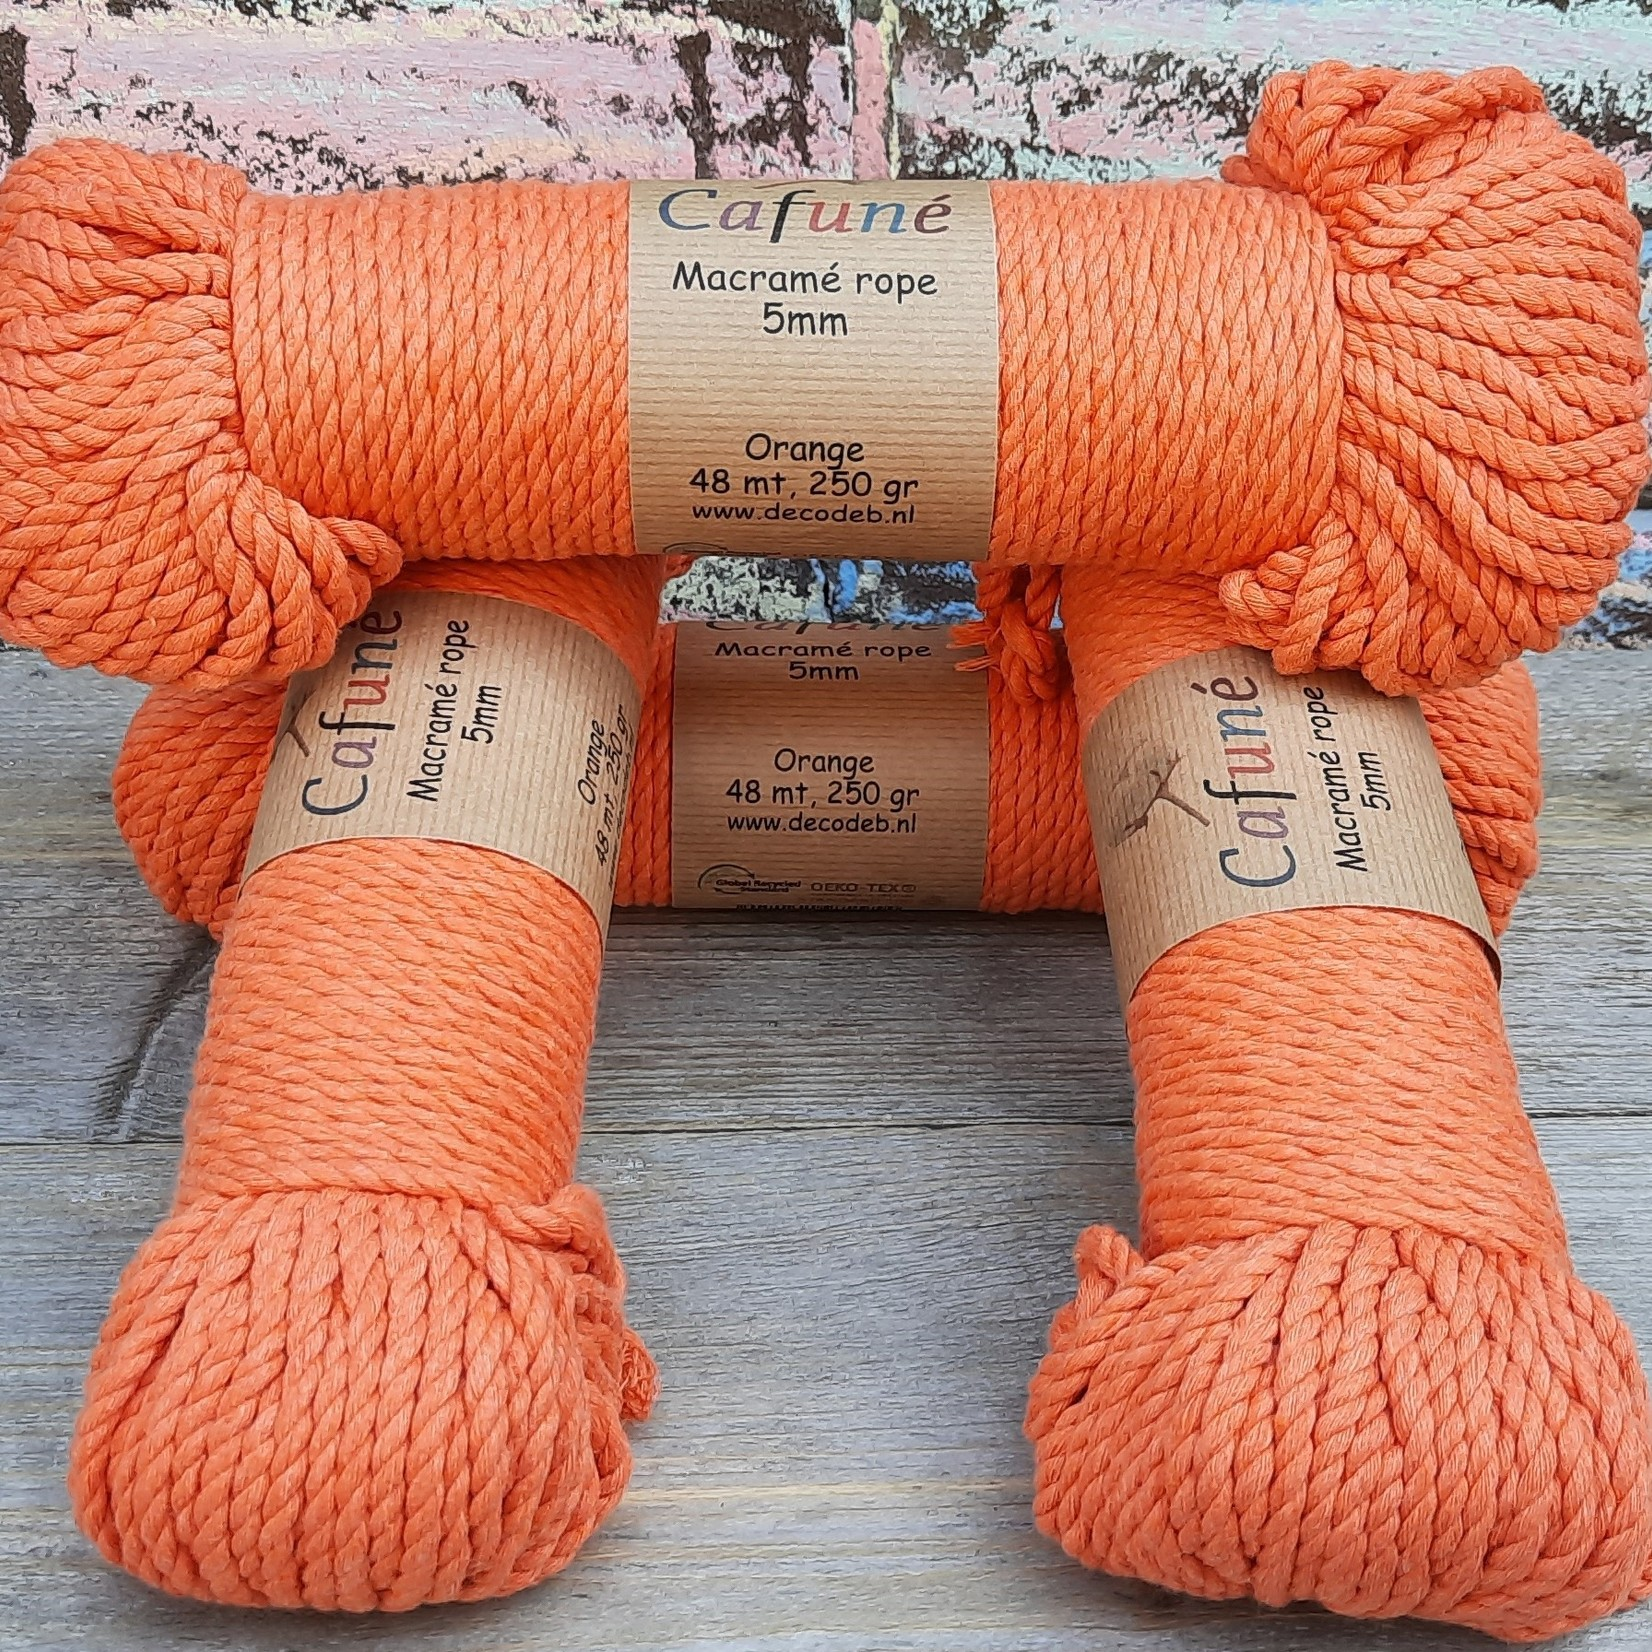 5mm Macrame touw Oranje, double twisted, uitkambaar